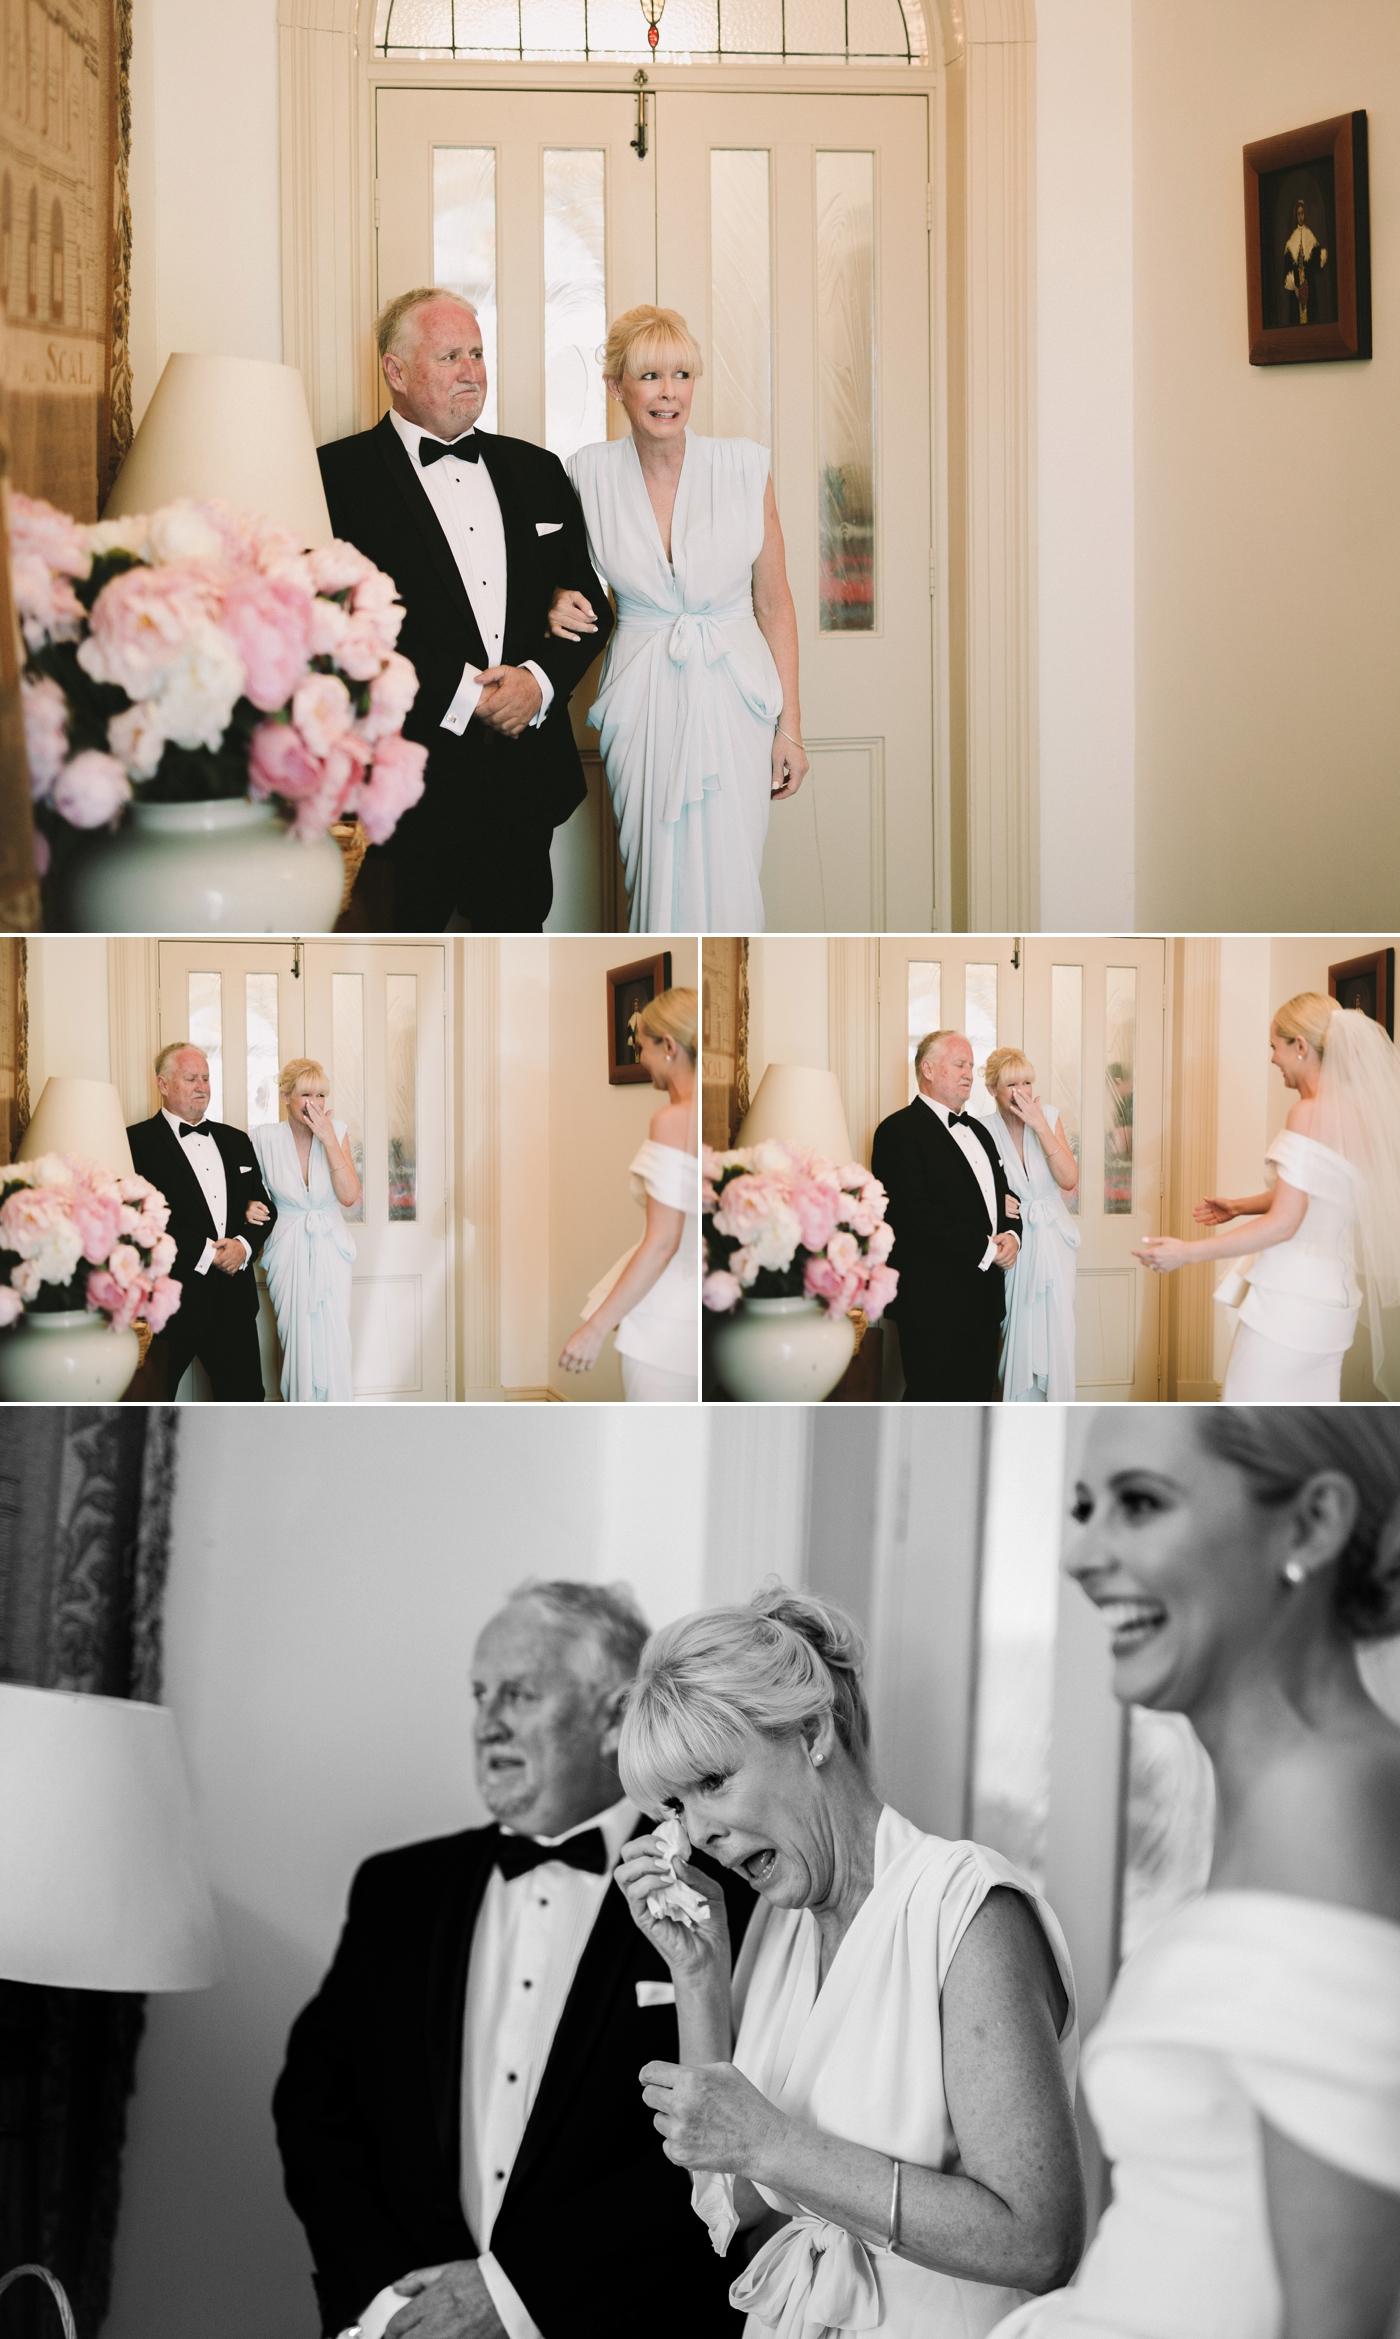 Bec & Brad - Waverley Estate Wedding - Natural Wedding Photographer in Adelaide - www.katherineschultzphotography.com 12